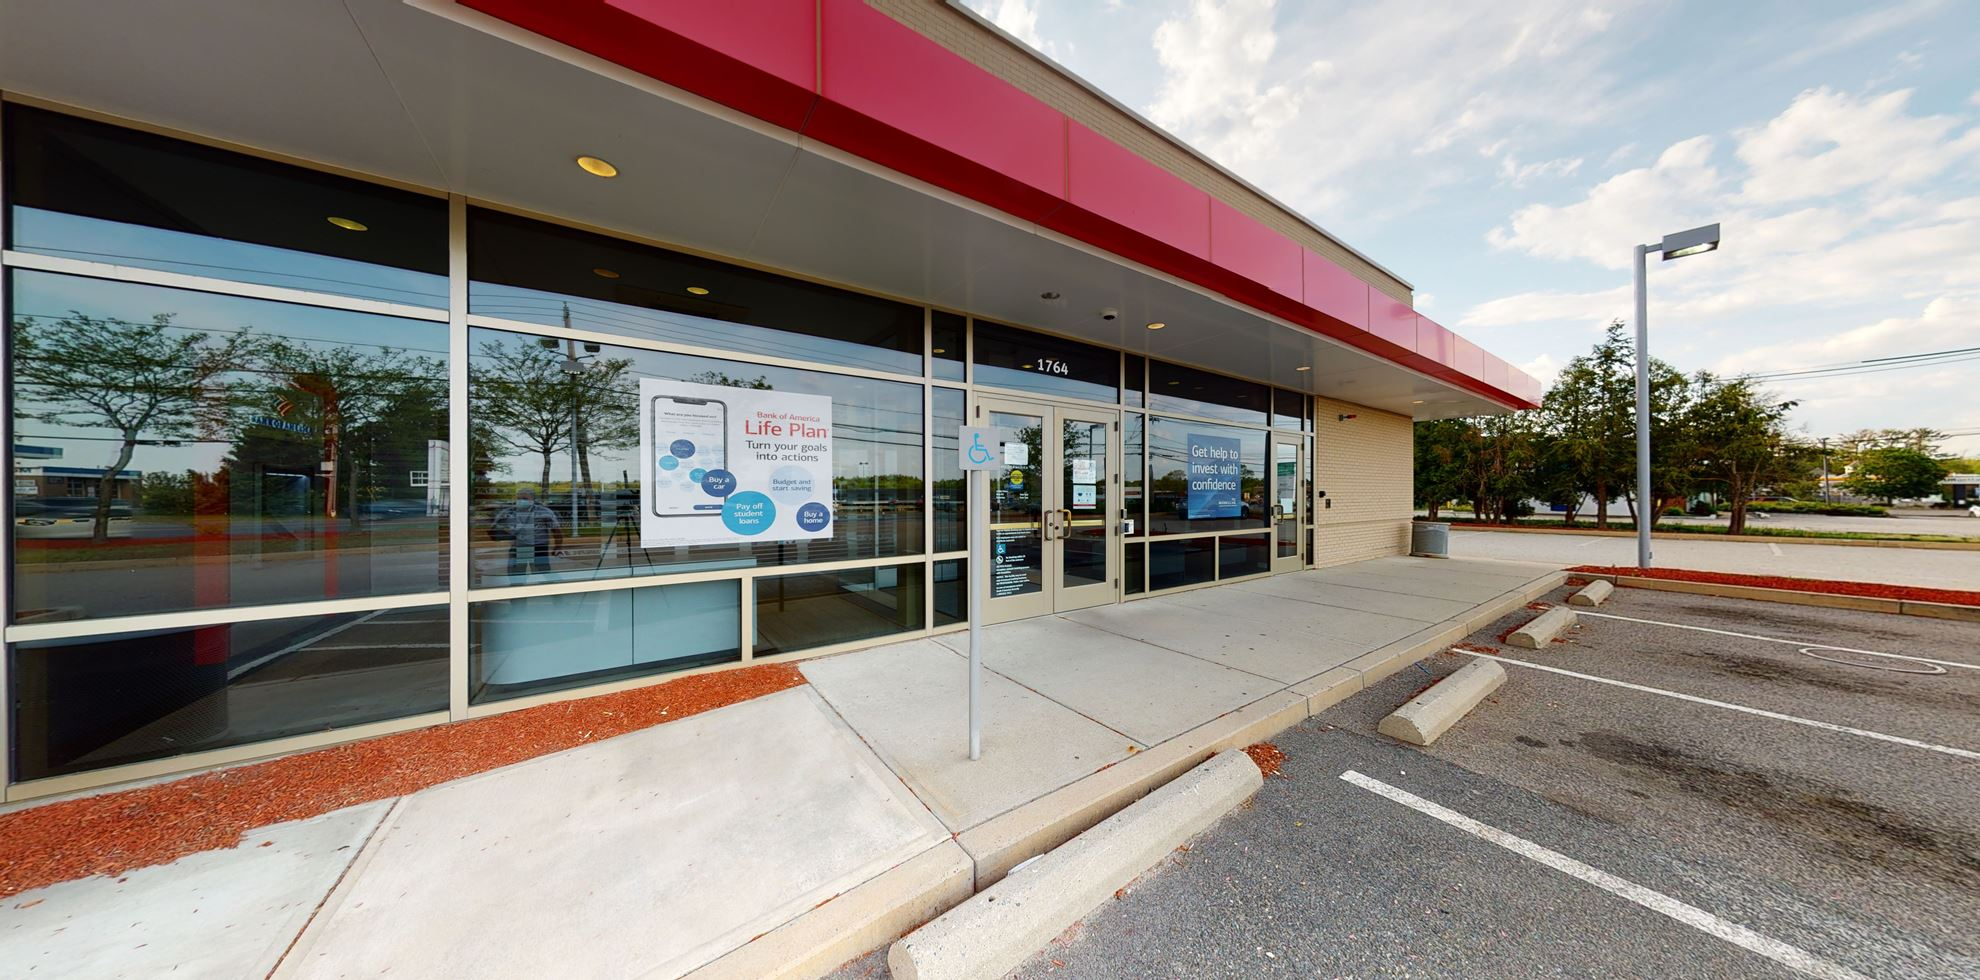 Bank of America financial center with drive-thru ATM | 1764 Washington St, Hanover, MA 02339